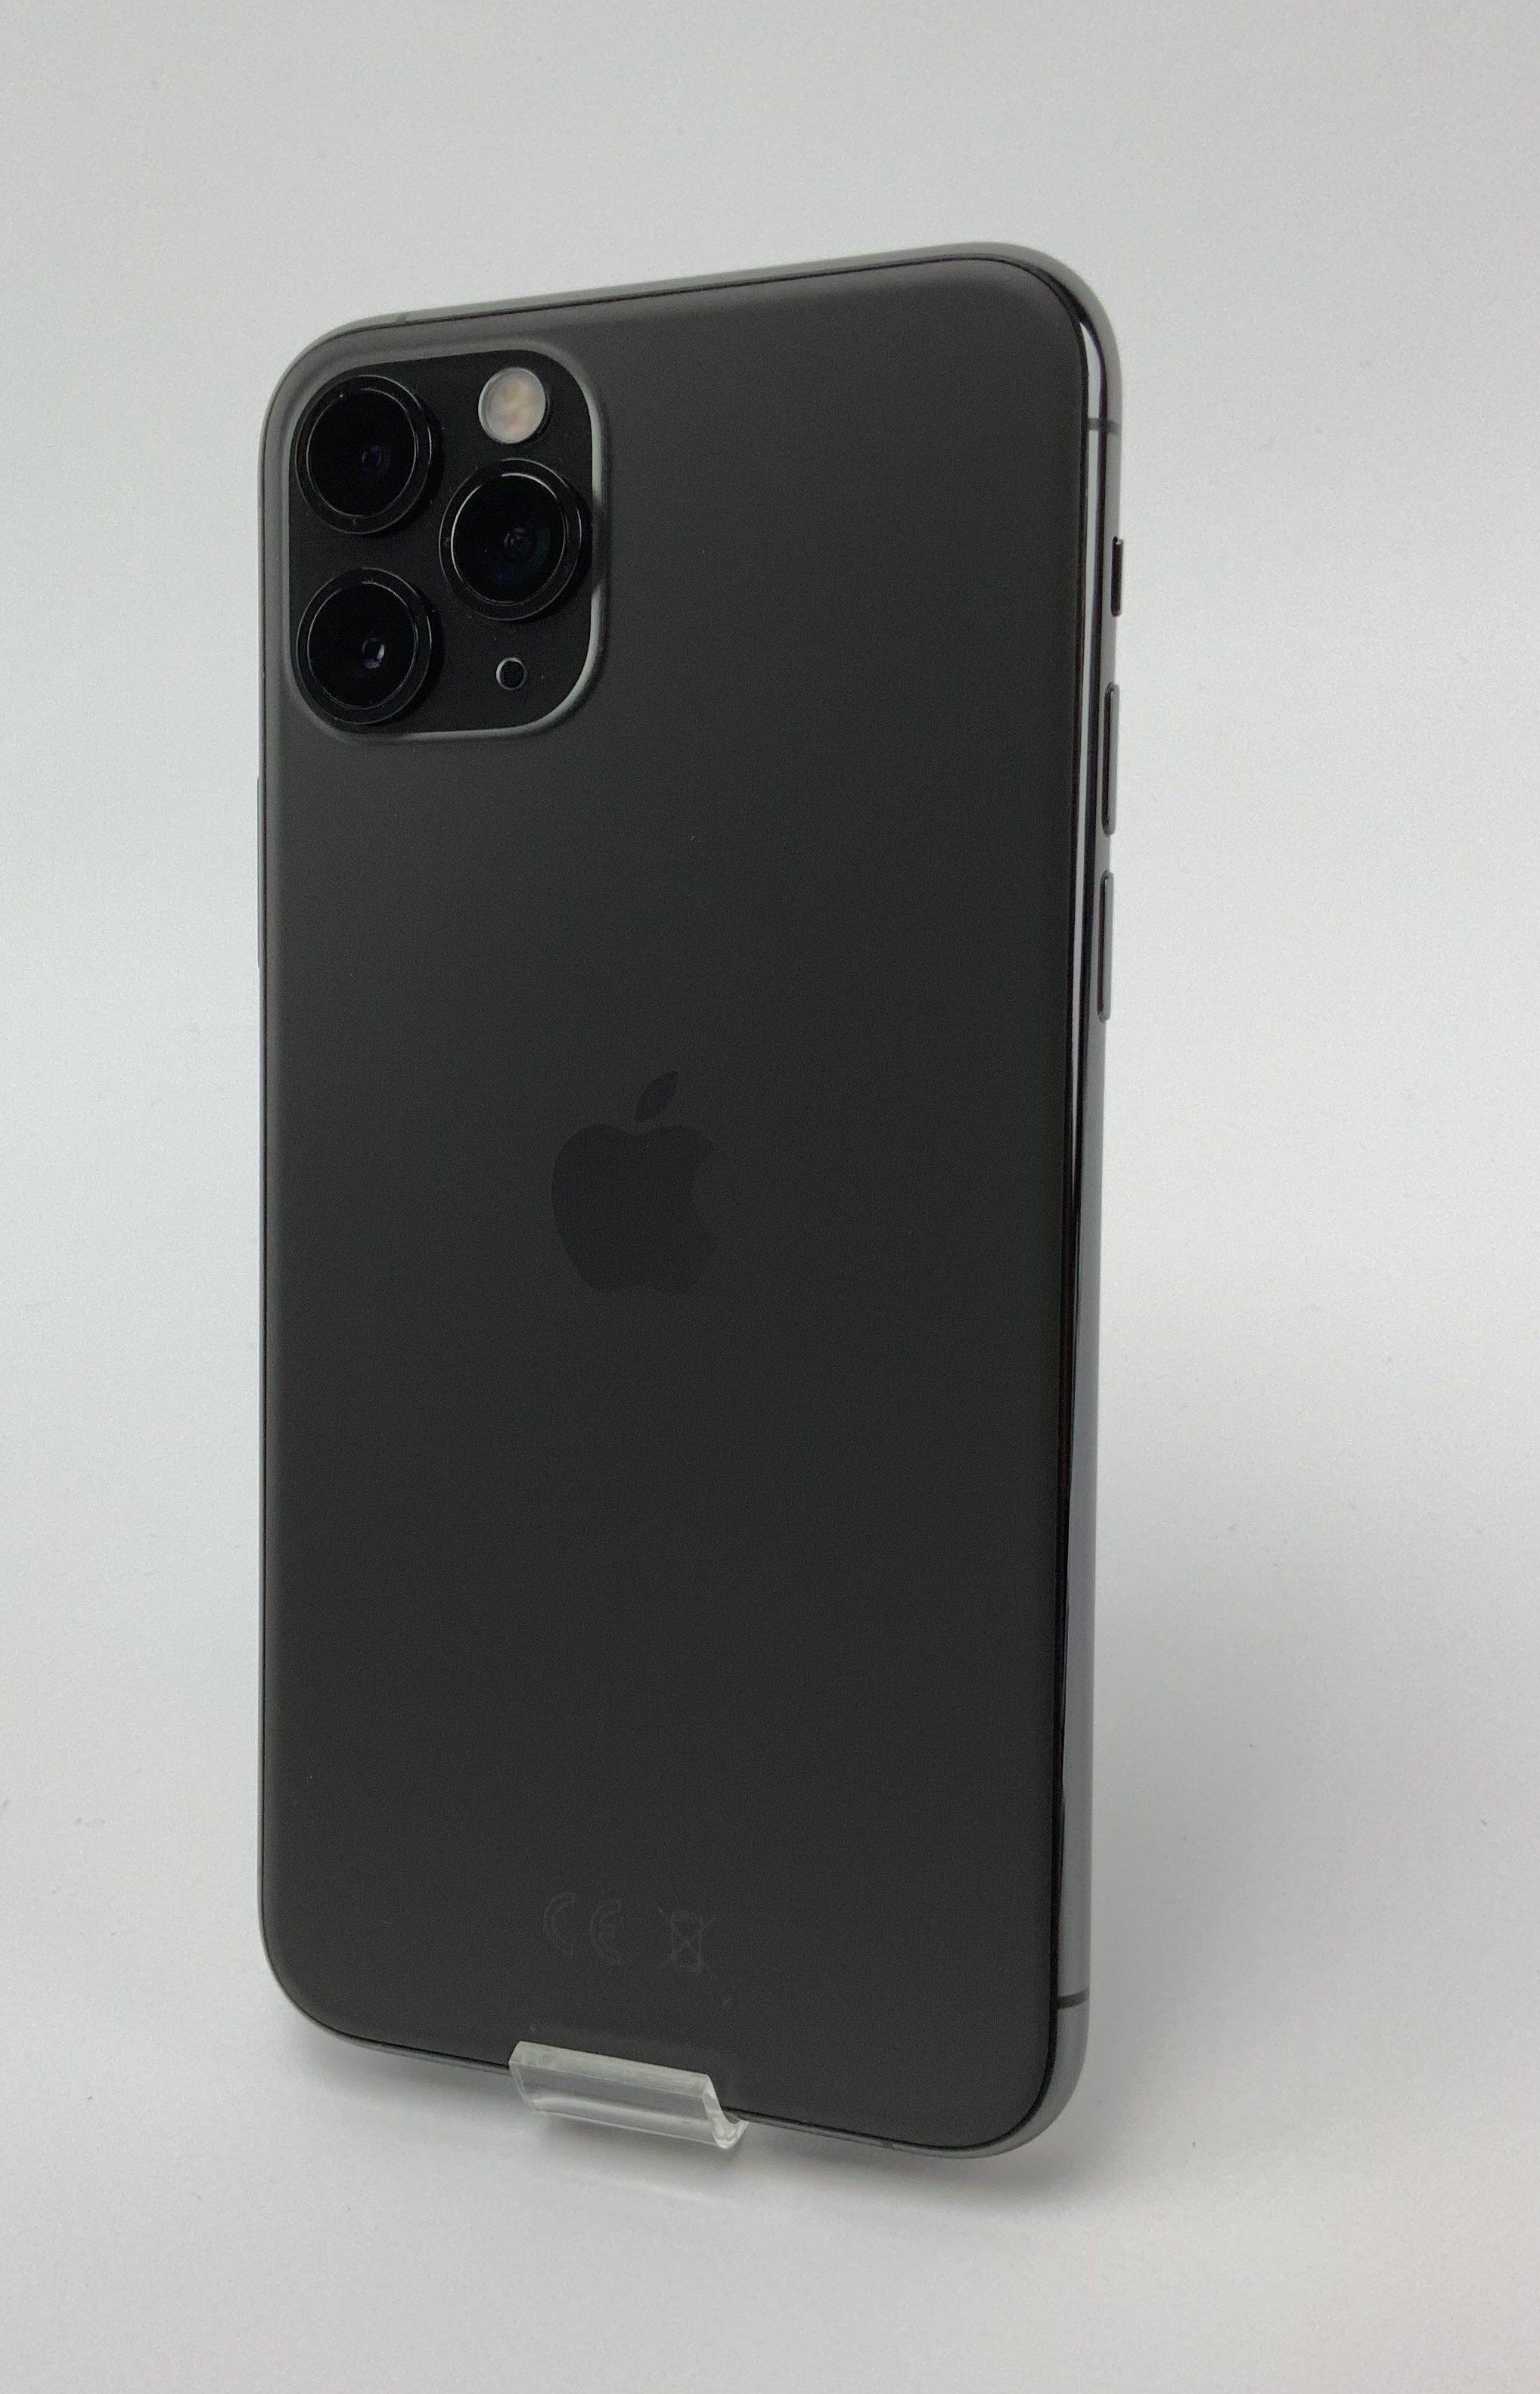 iPhone 11 Pro 256GB, 256GB, Space Gray, bild 2